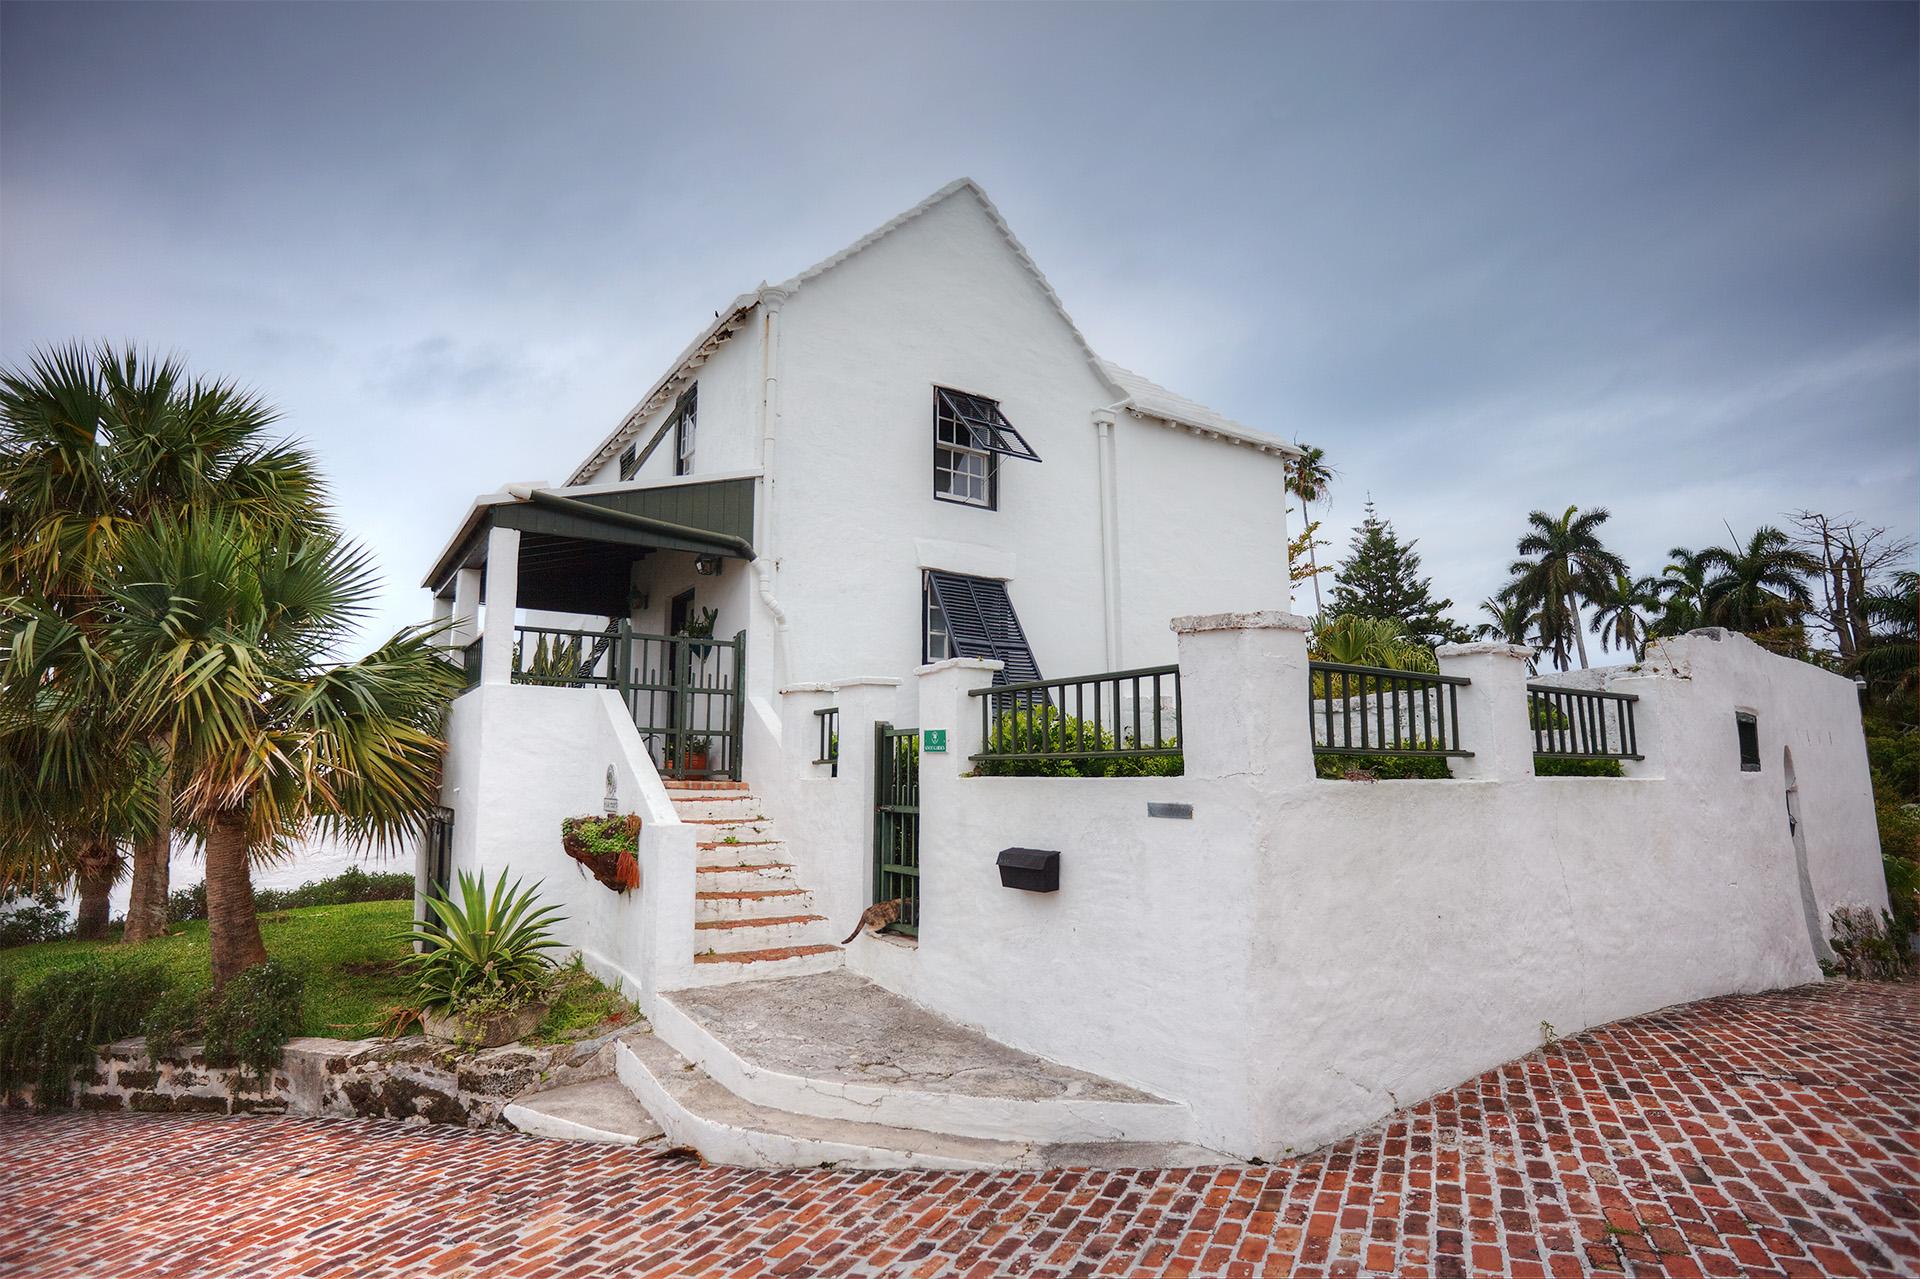 Reeve Court House, St George, Bermuda.